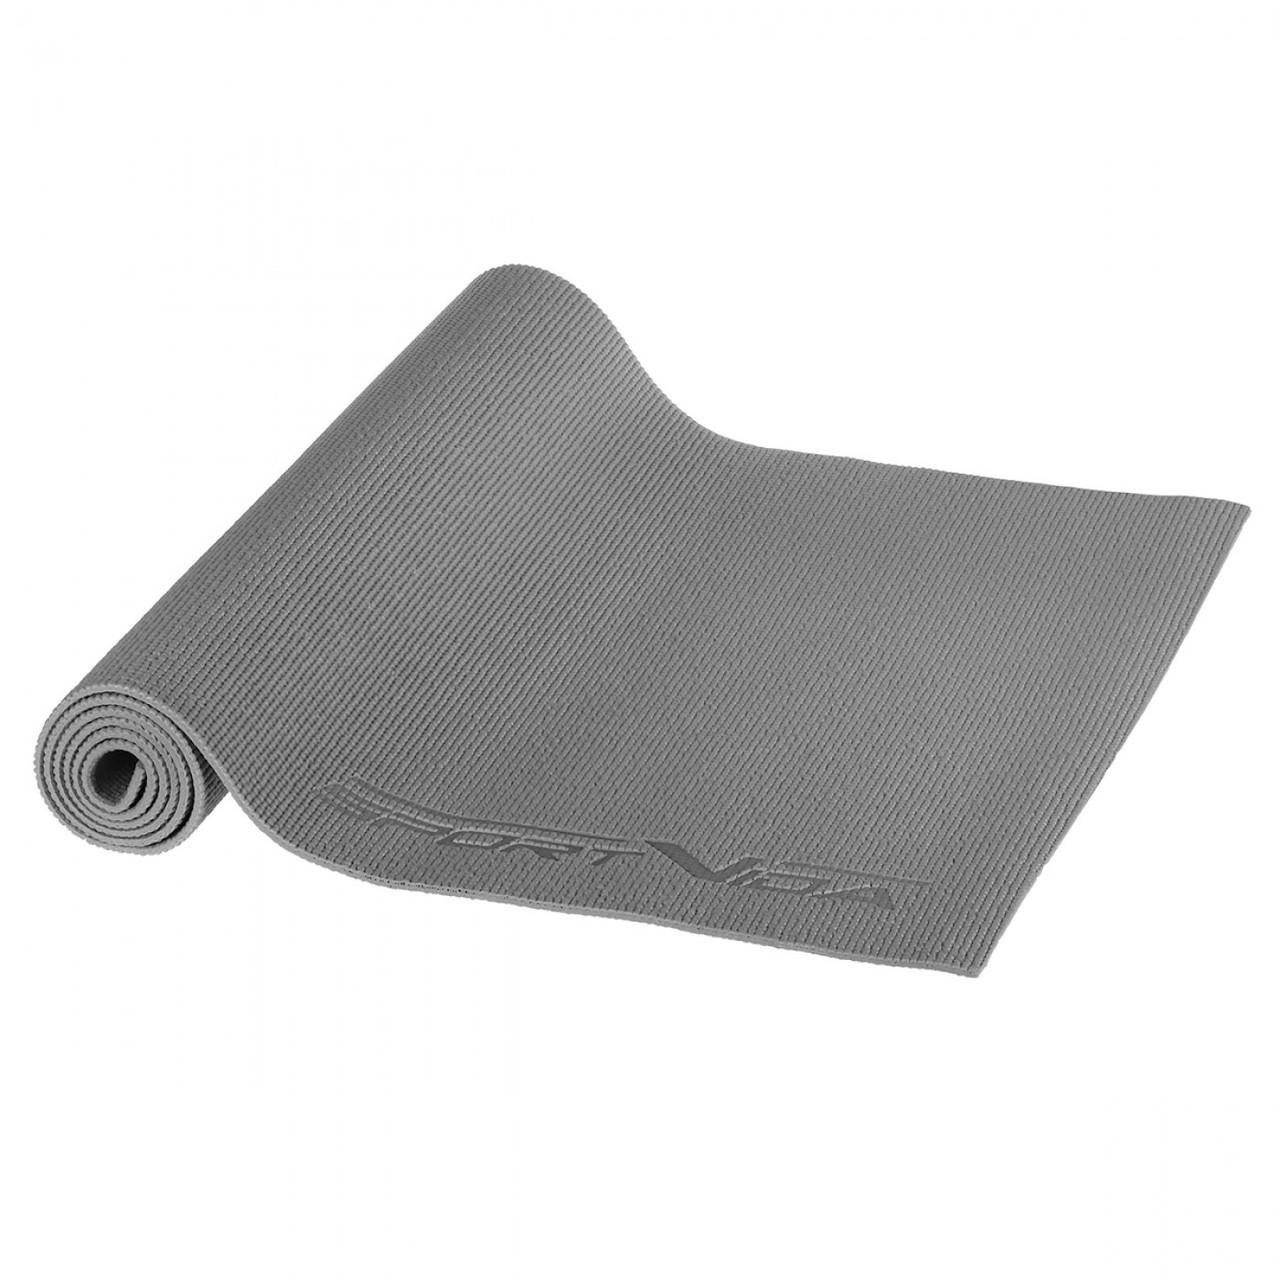 Килимок (мат) для йоги та фітнесу SportVida PVC 6 мм SV-HK0054 Grey